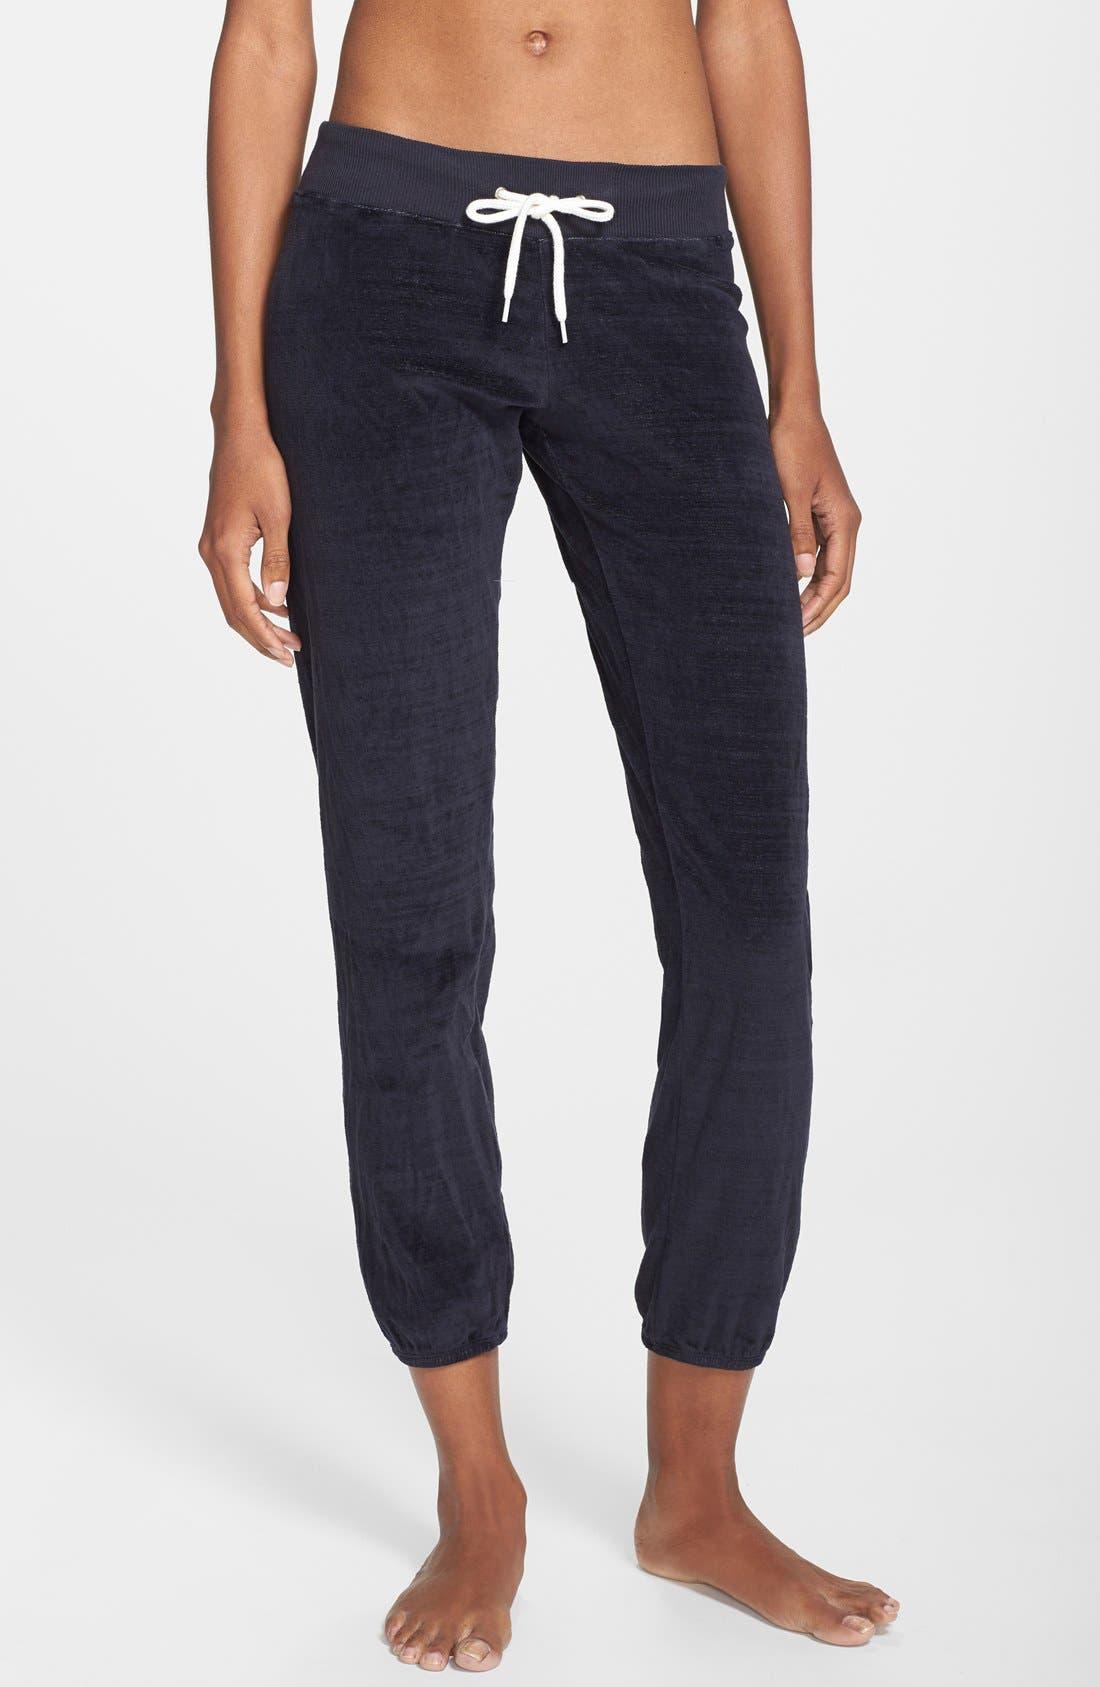 Main Image - Monrow 'Cosmic' Vintage Velour Sweatpants